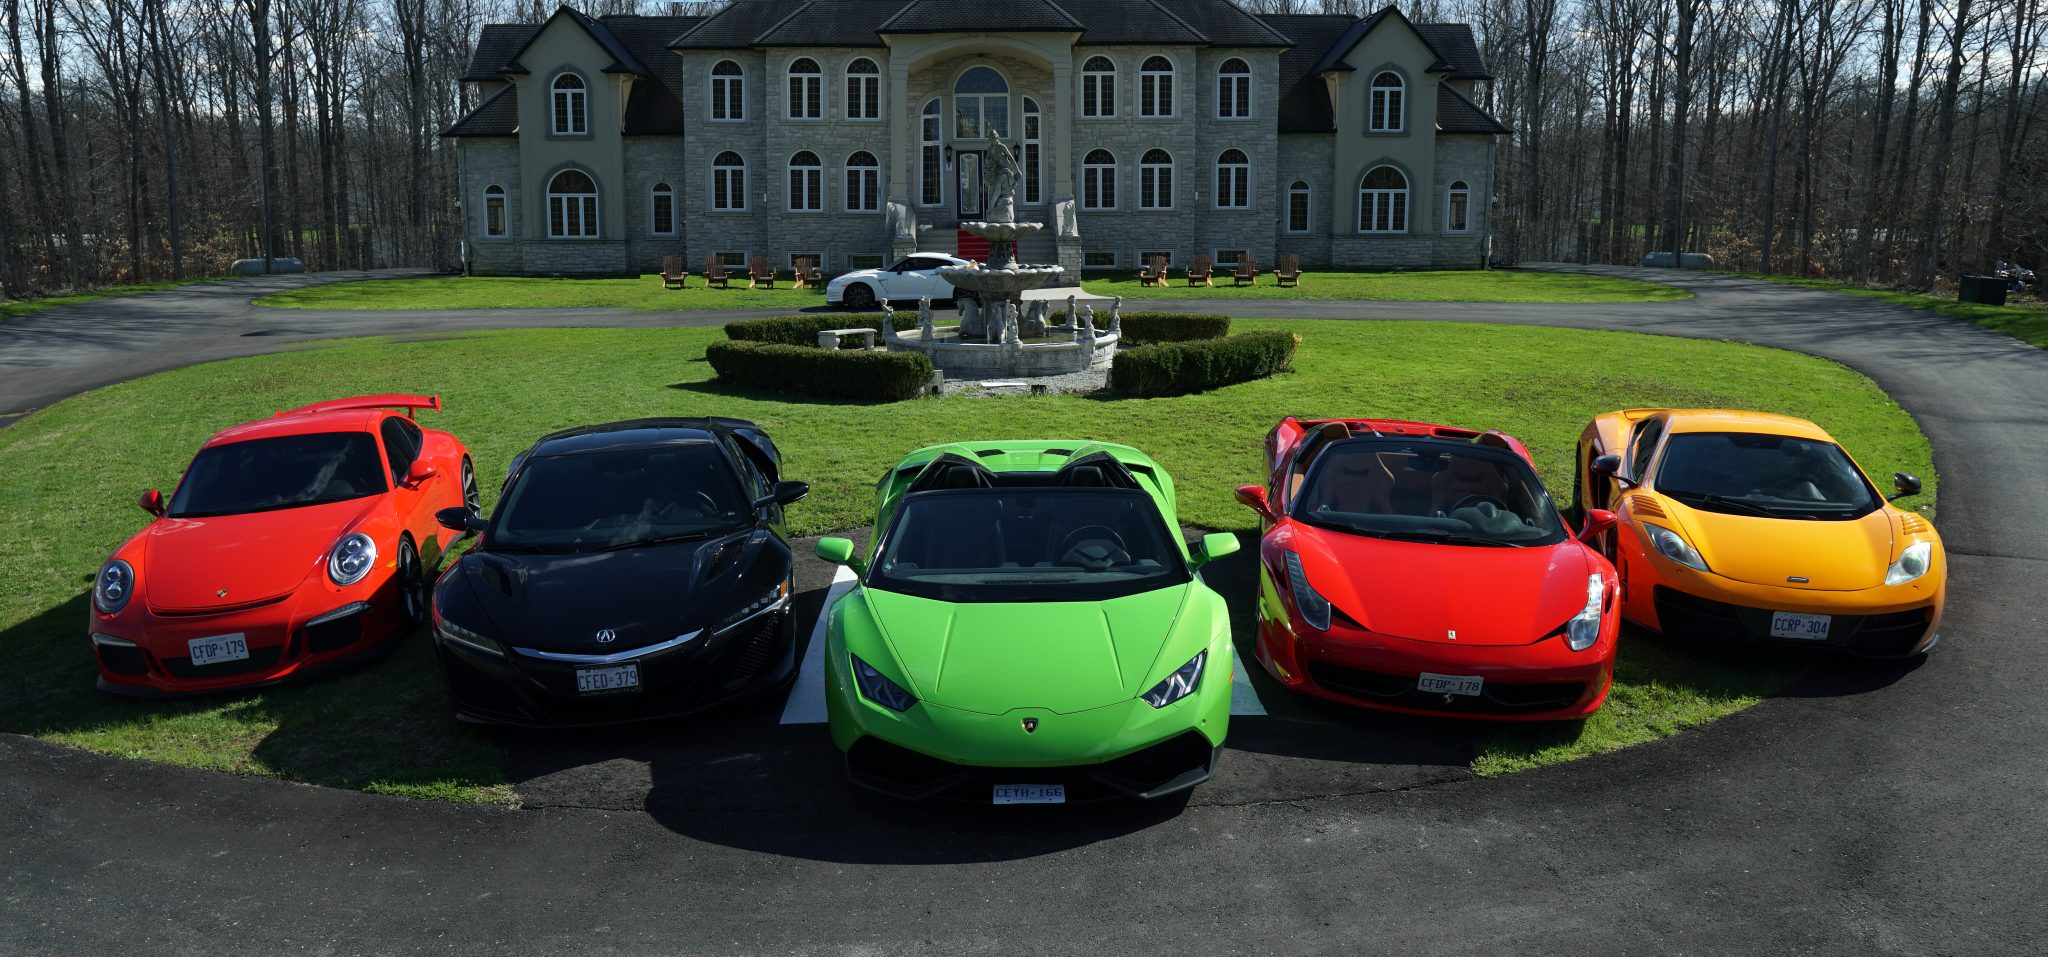 Lamborghini Rental: The Ultimate Dream for Luxury Driving